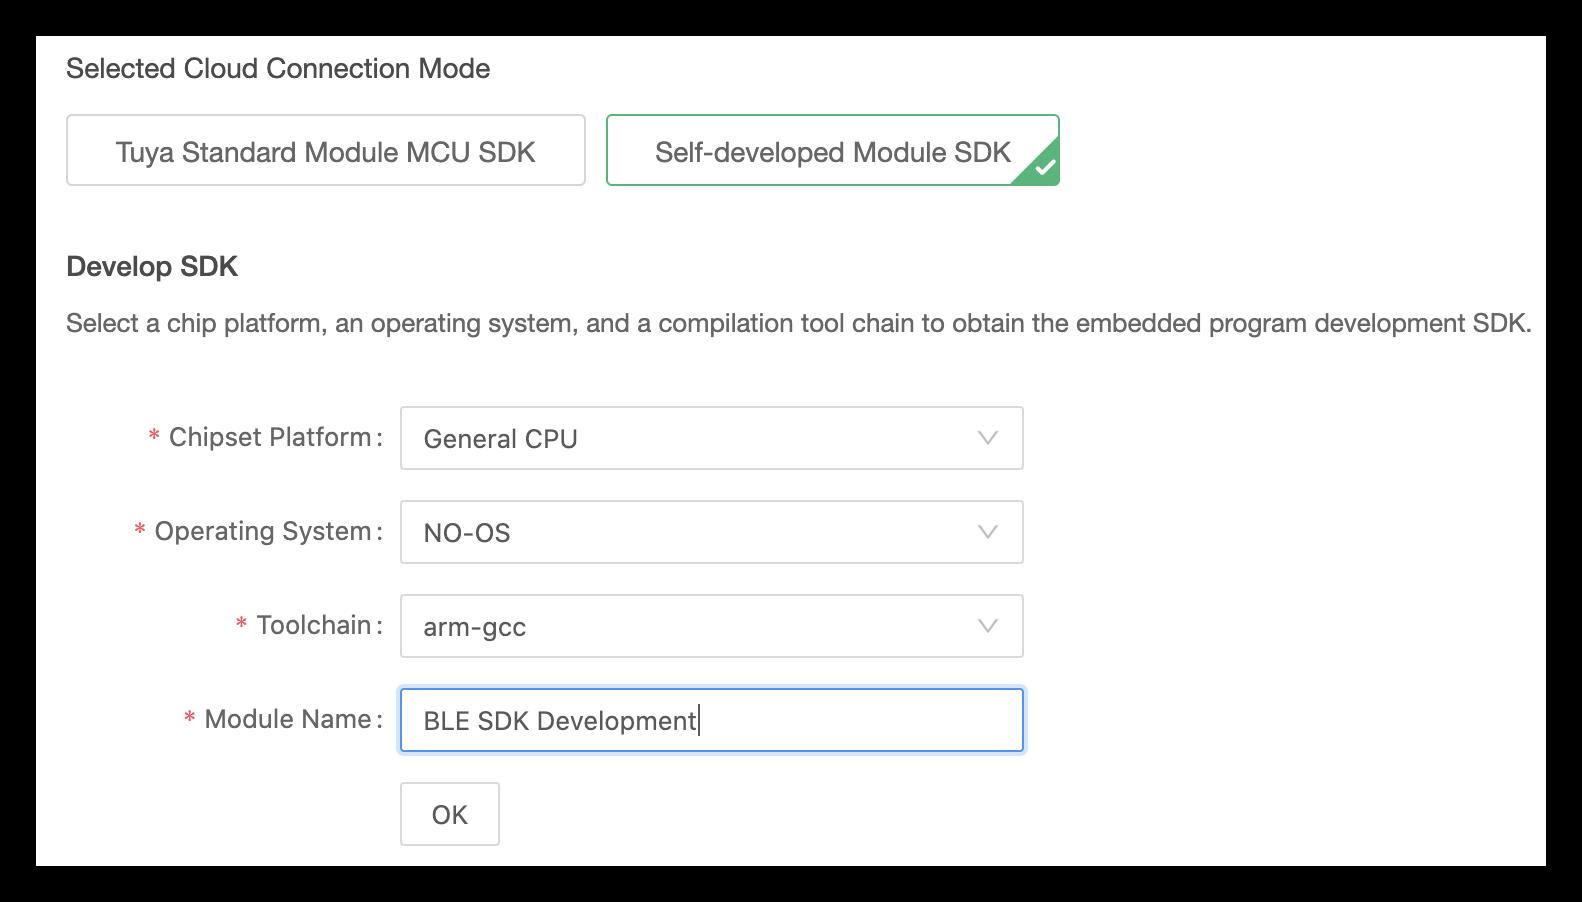 Self-developed Module SDK